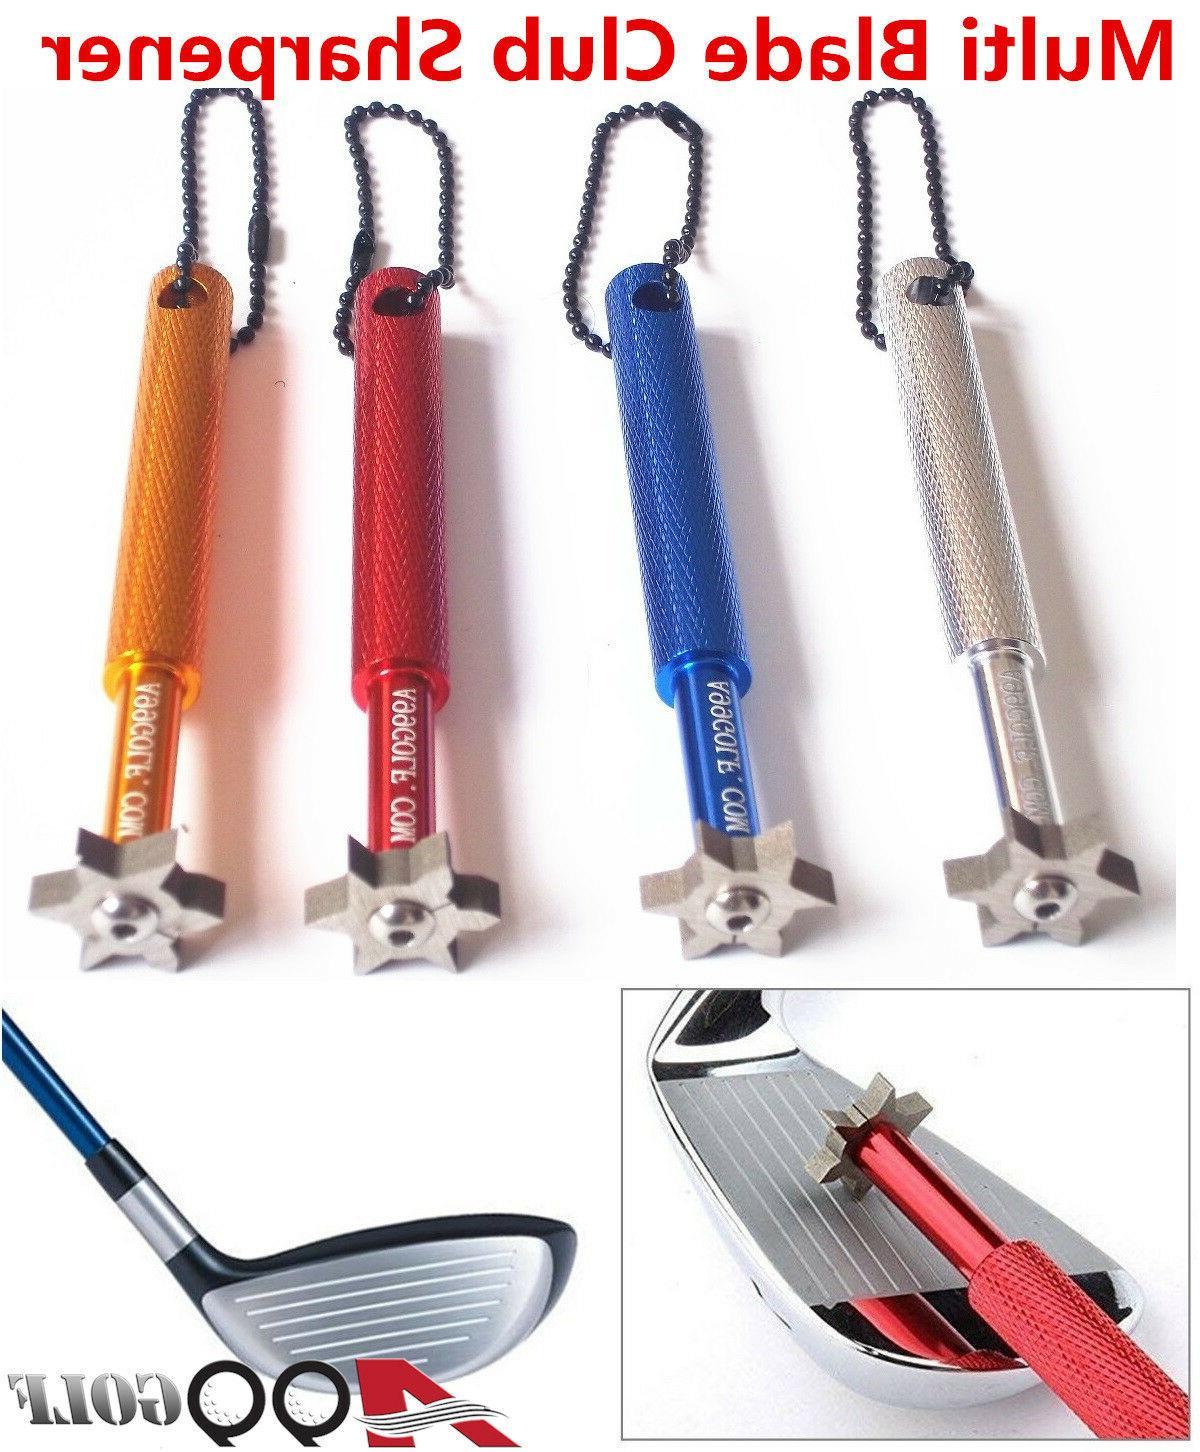 multi blade club sharpener wedge and iron